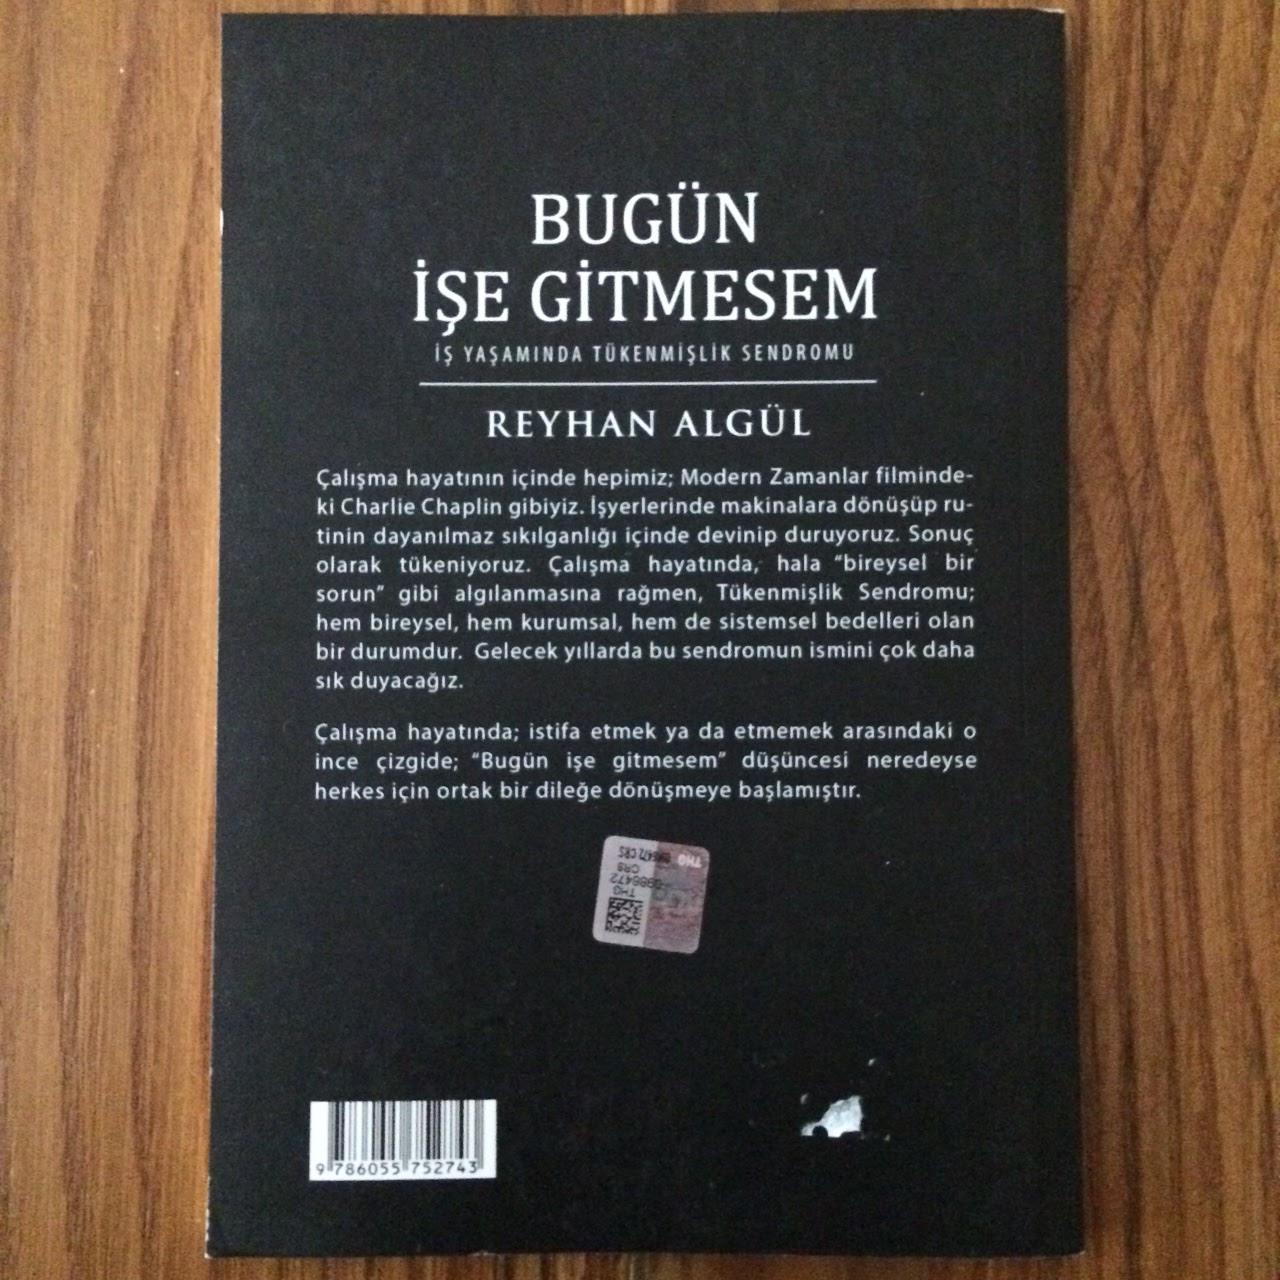 Bugun Ise Gitmesem -  Calisma Hayatinda Tukenmislik Sendromu (Kitap) Arka Kapak